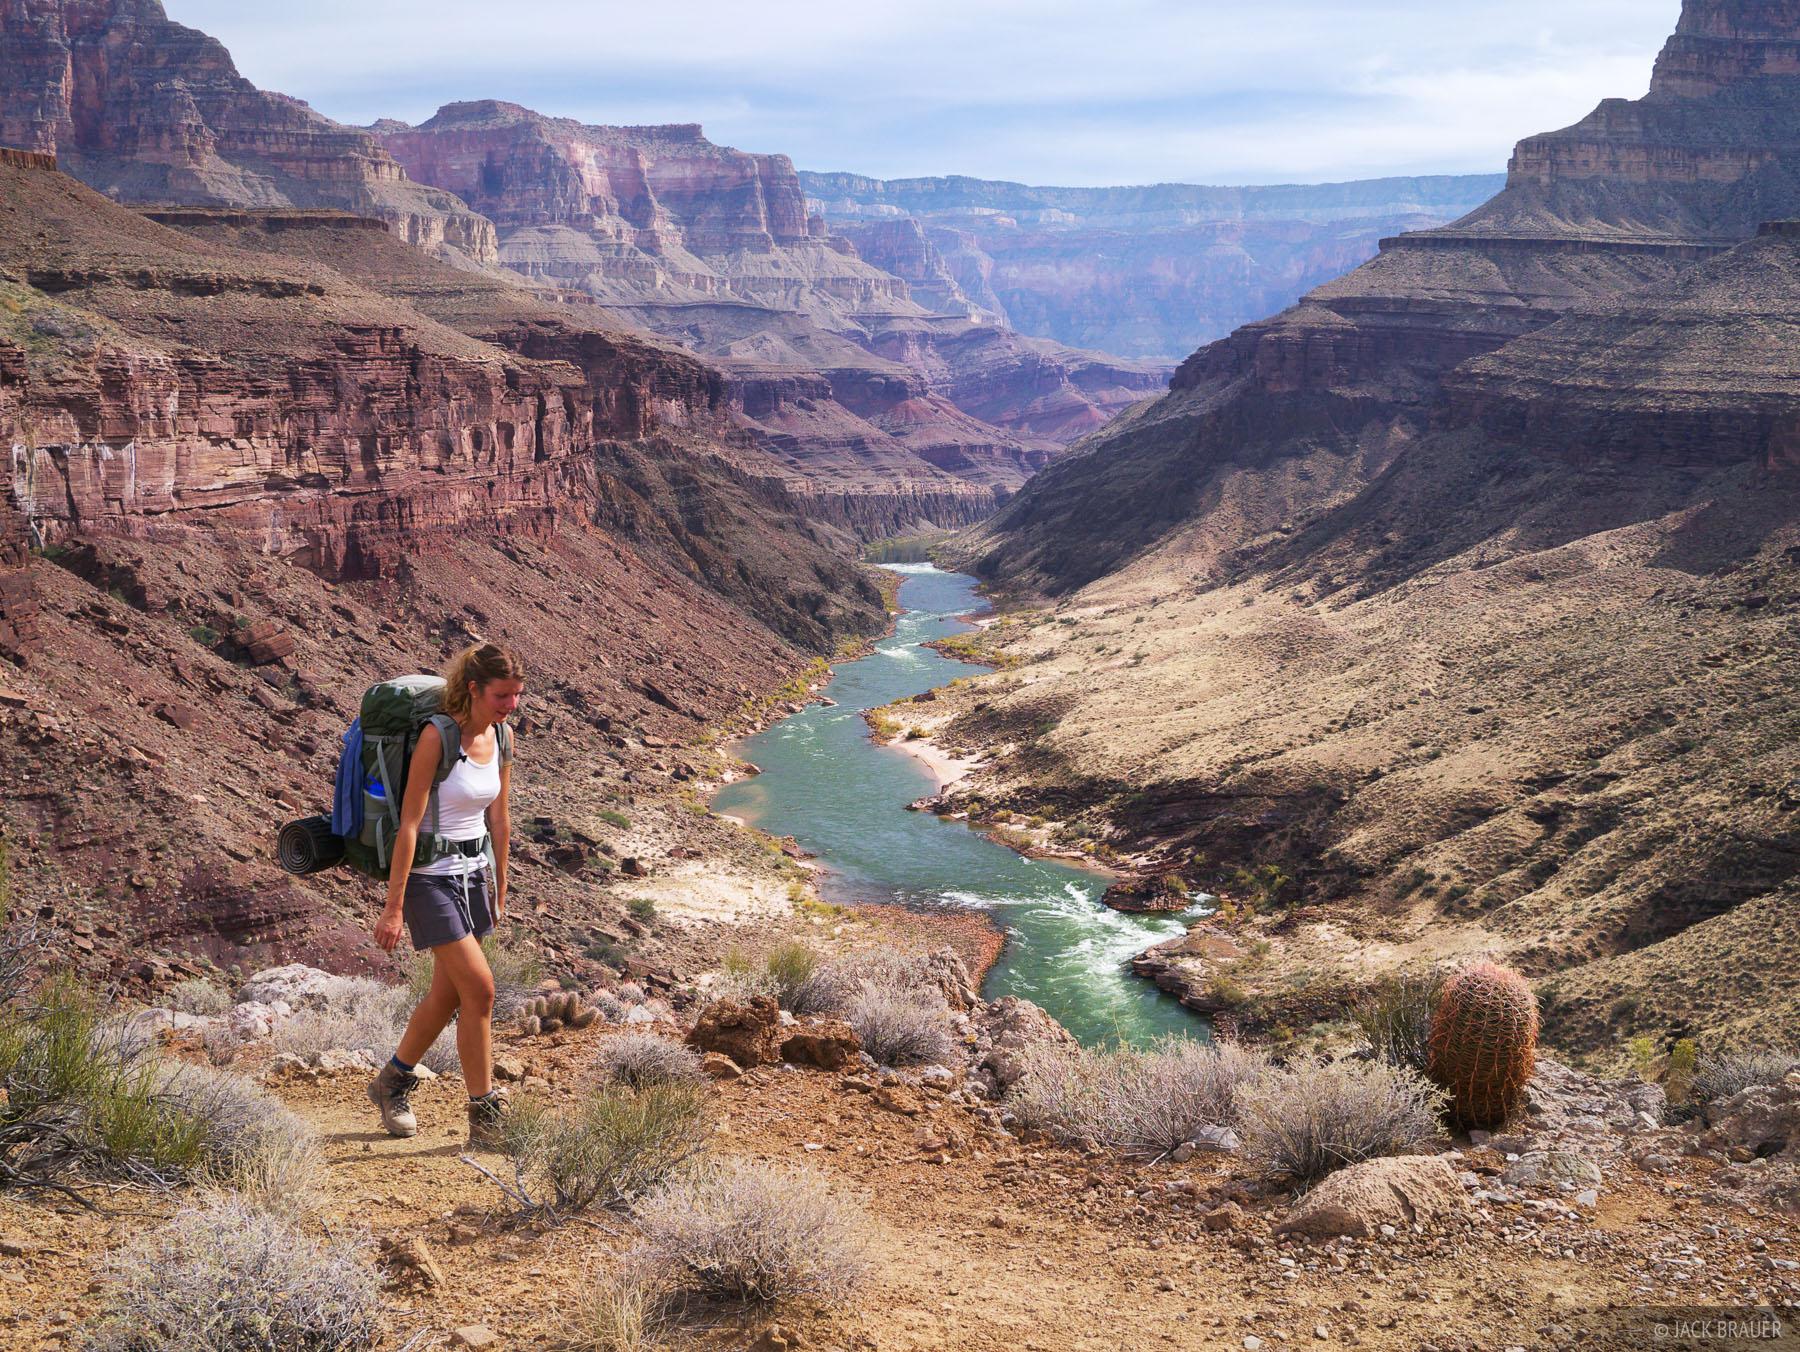 Arizona, Grand Canyon, Colorado River, hiking, photo